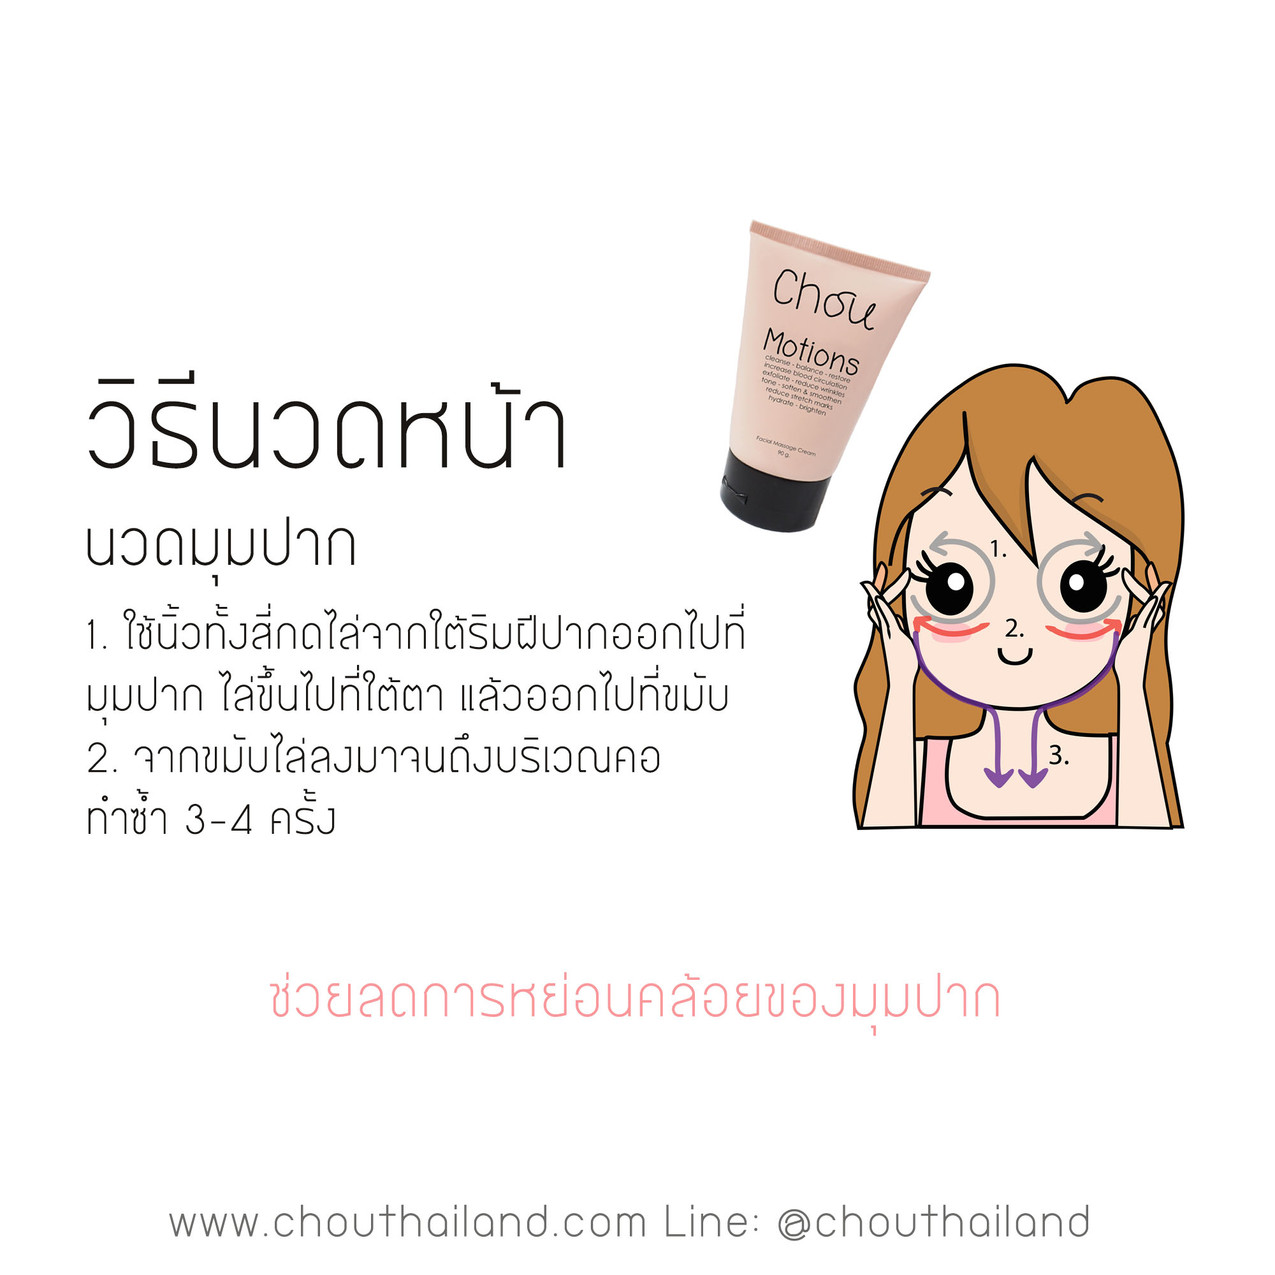 Motions Massage cream 6 Mouth massage